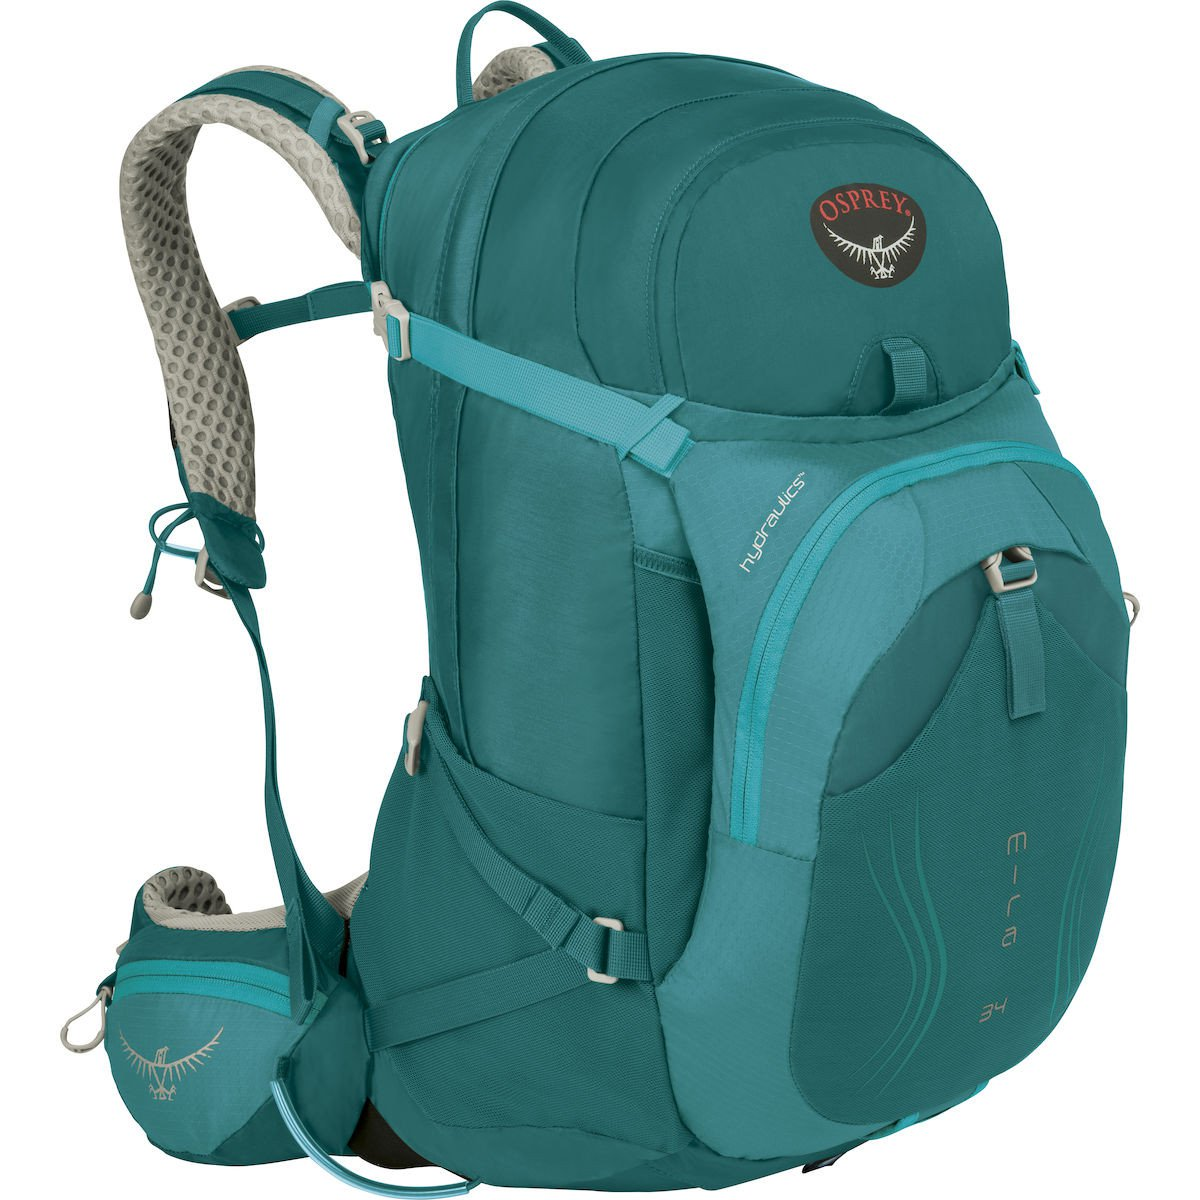 sac a dos osprey femme